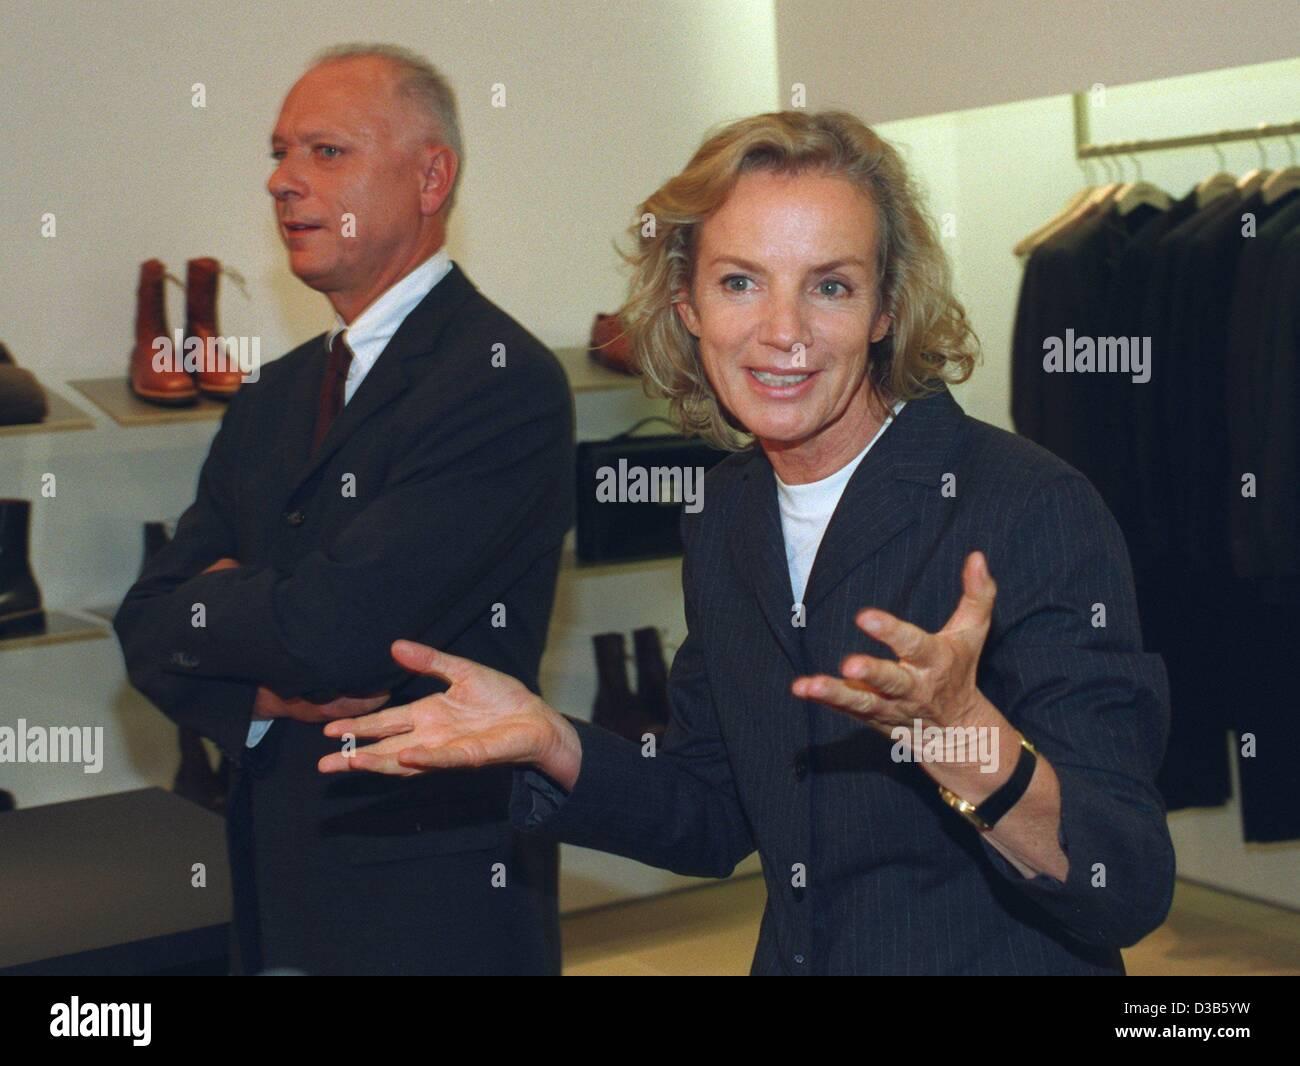 Dpa Files The German Fashion Designer Jil Sander And The Head Of Stock Photo Alamy